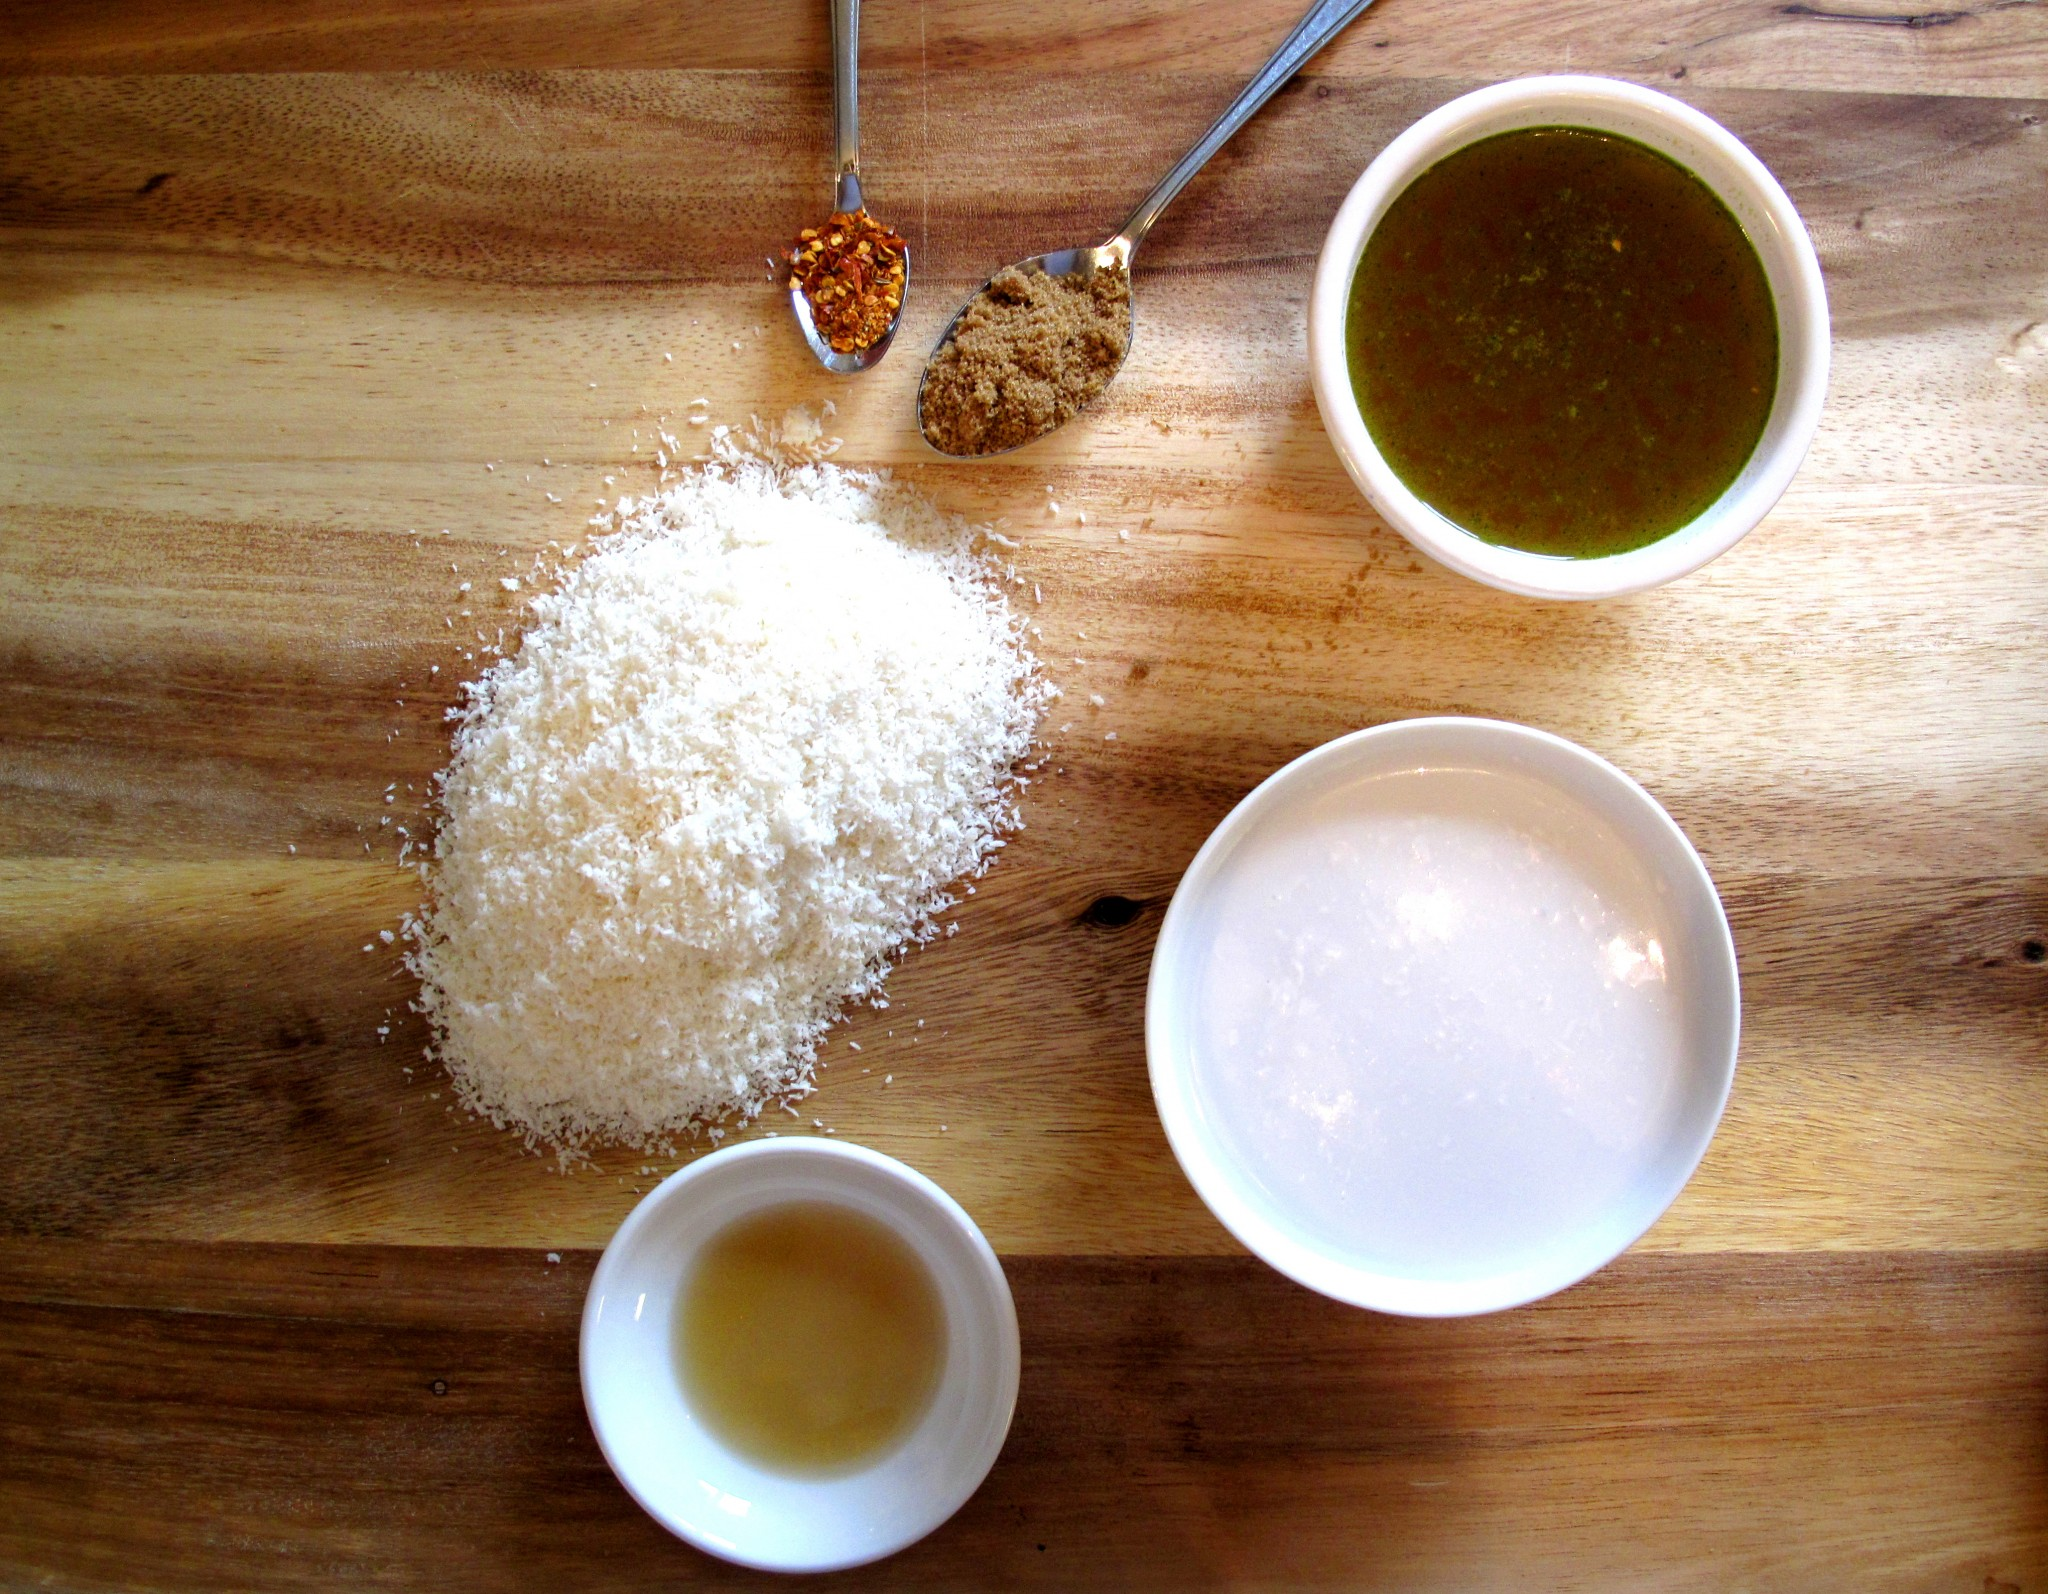 butternut squash courgette vegetarian thai red curry